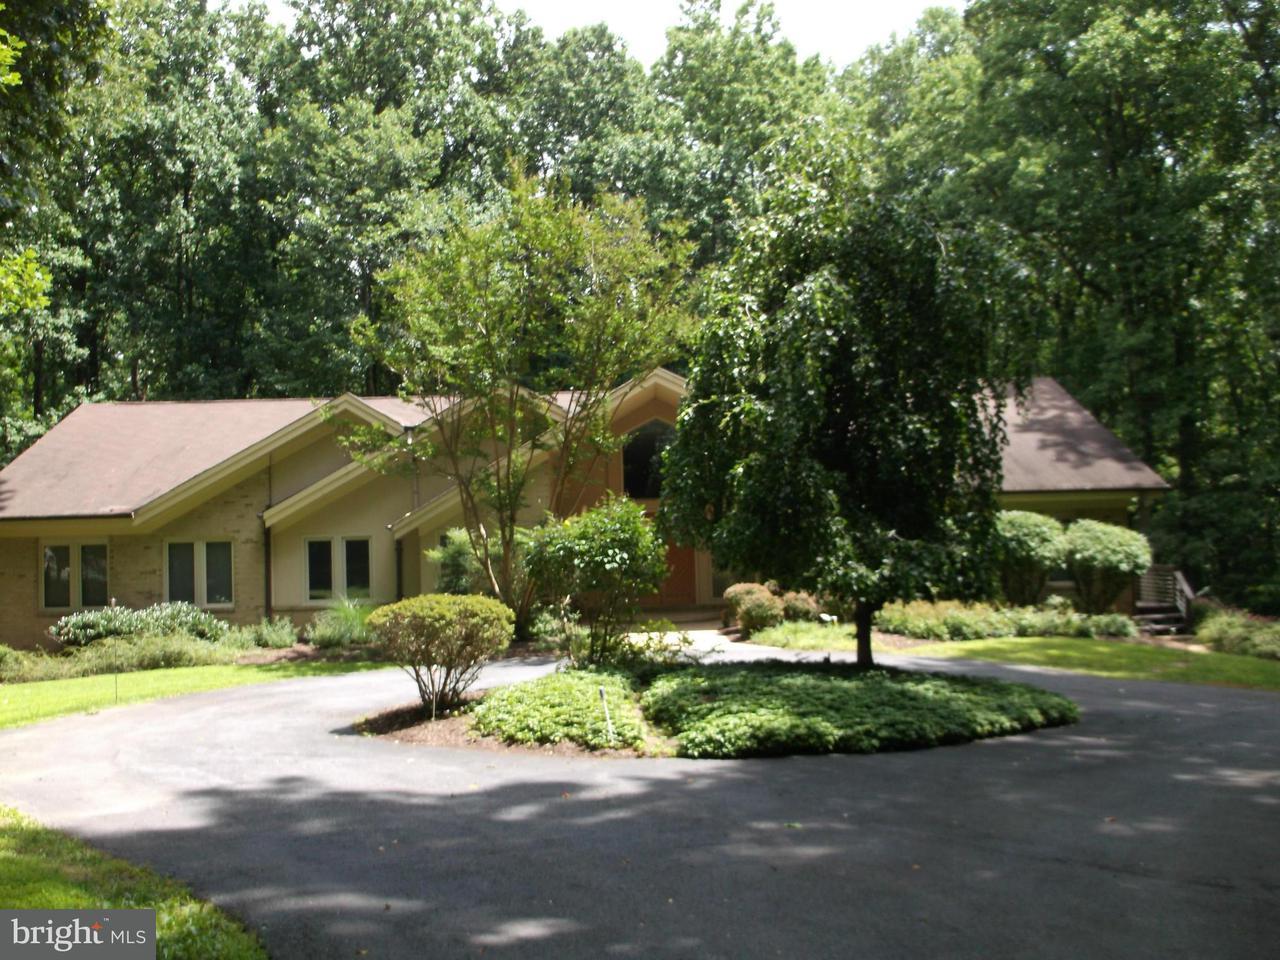 Maison unifamiliale pour l Vente à 17513 Sir Galahad Way 17513 Sir Galahad Way Ashton, Maryland 20861 États-Unis